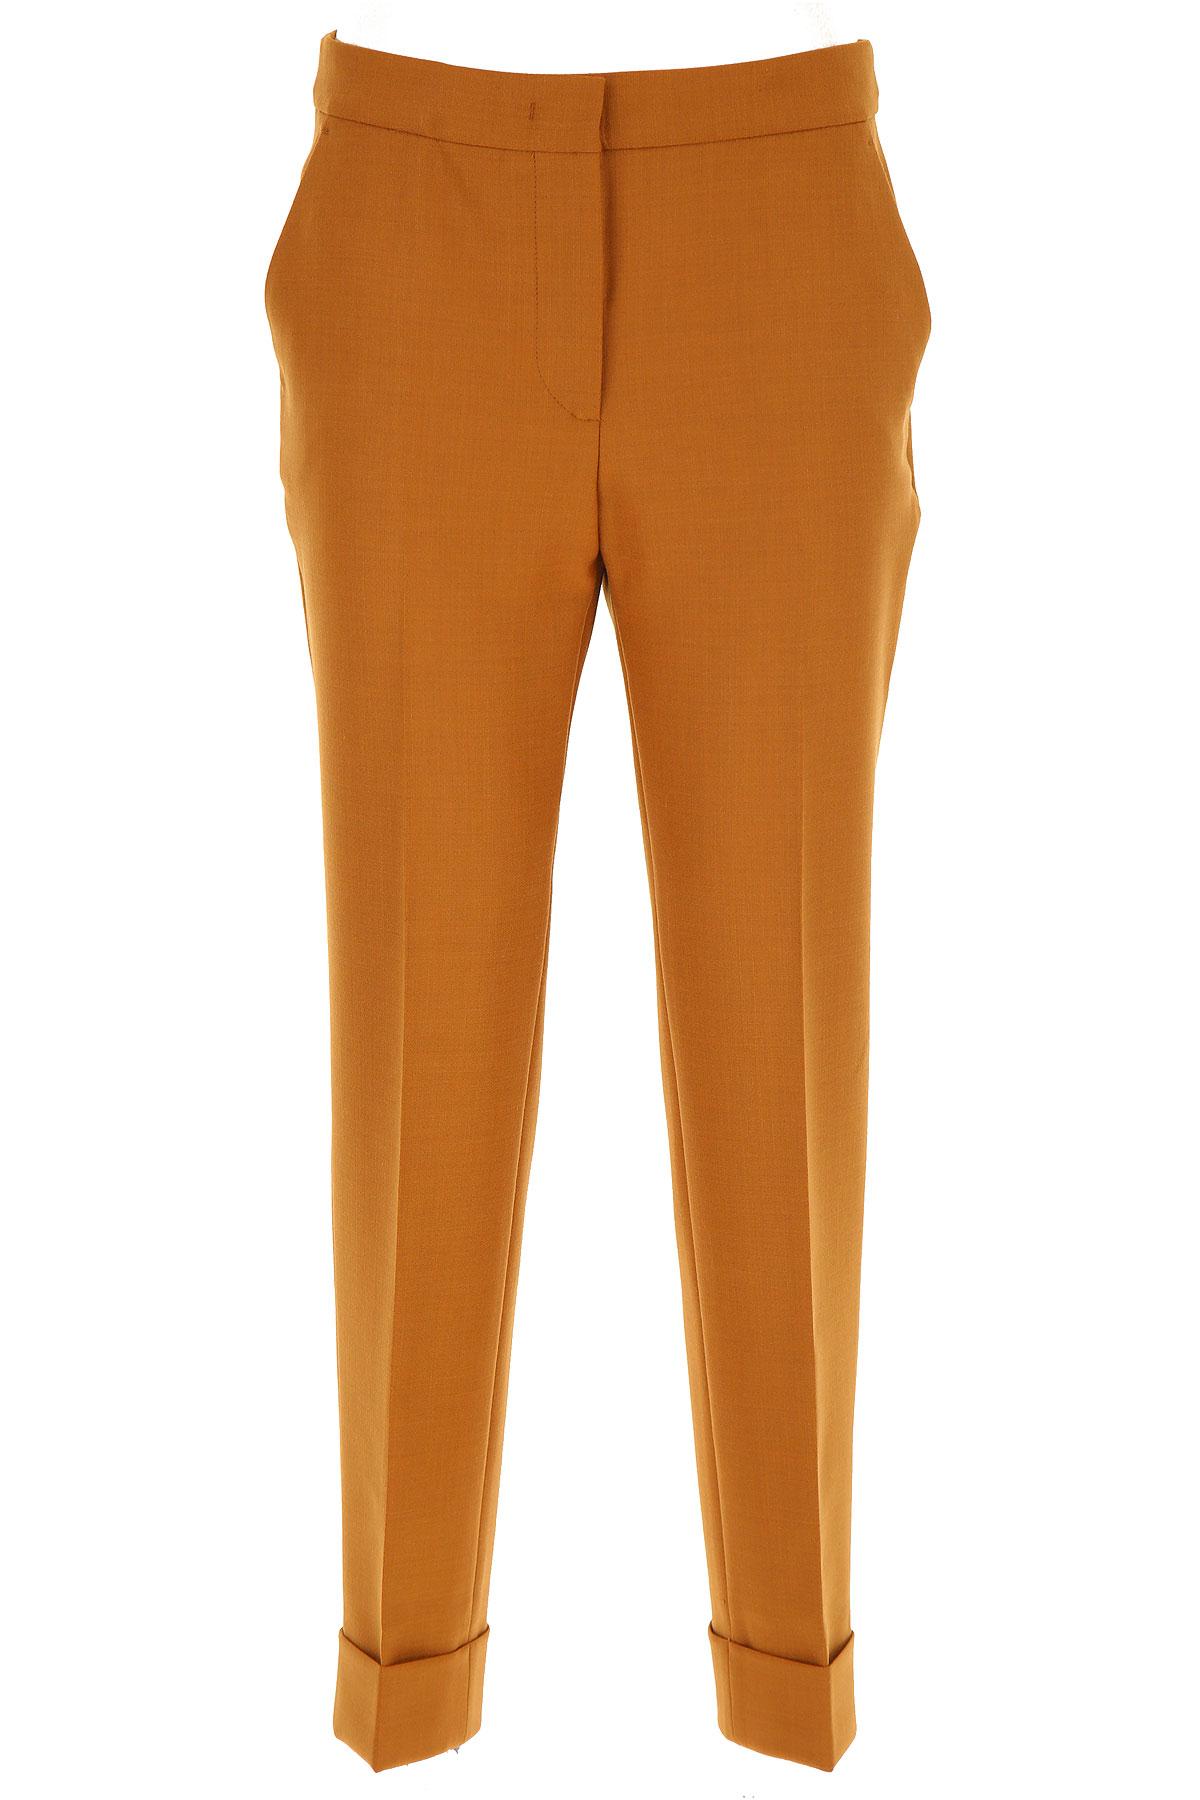 PT01 Pants for Women On Sale, Brick Orange, polyester, 2019, 26 32